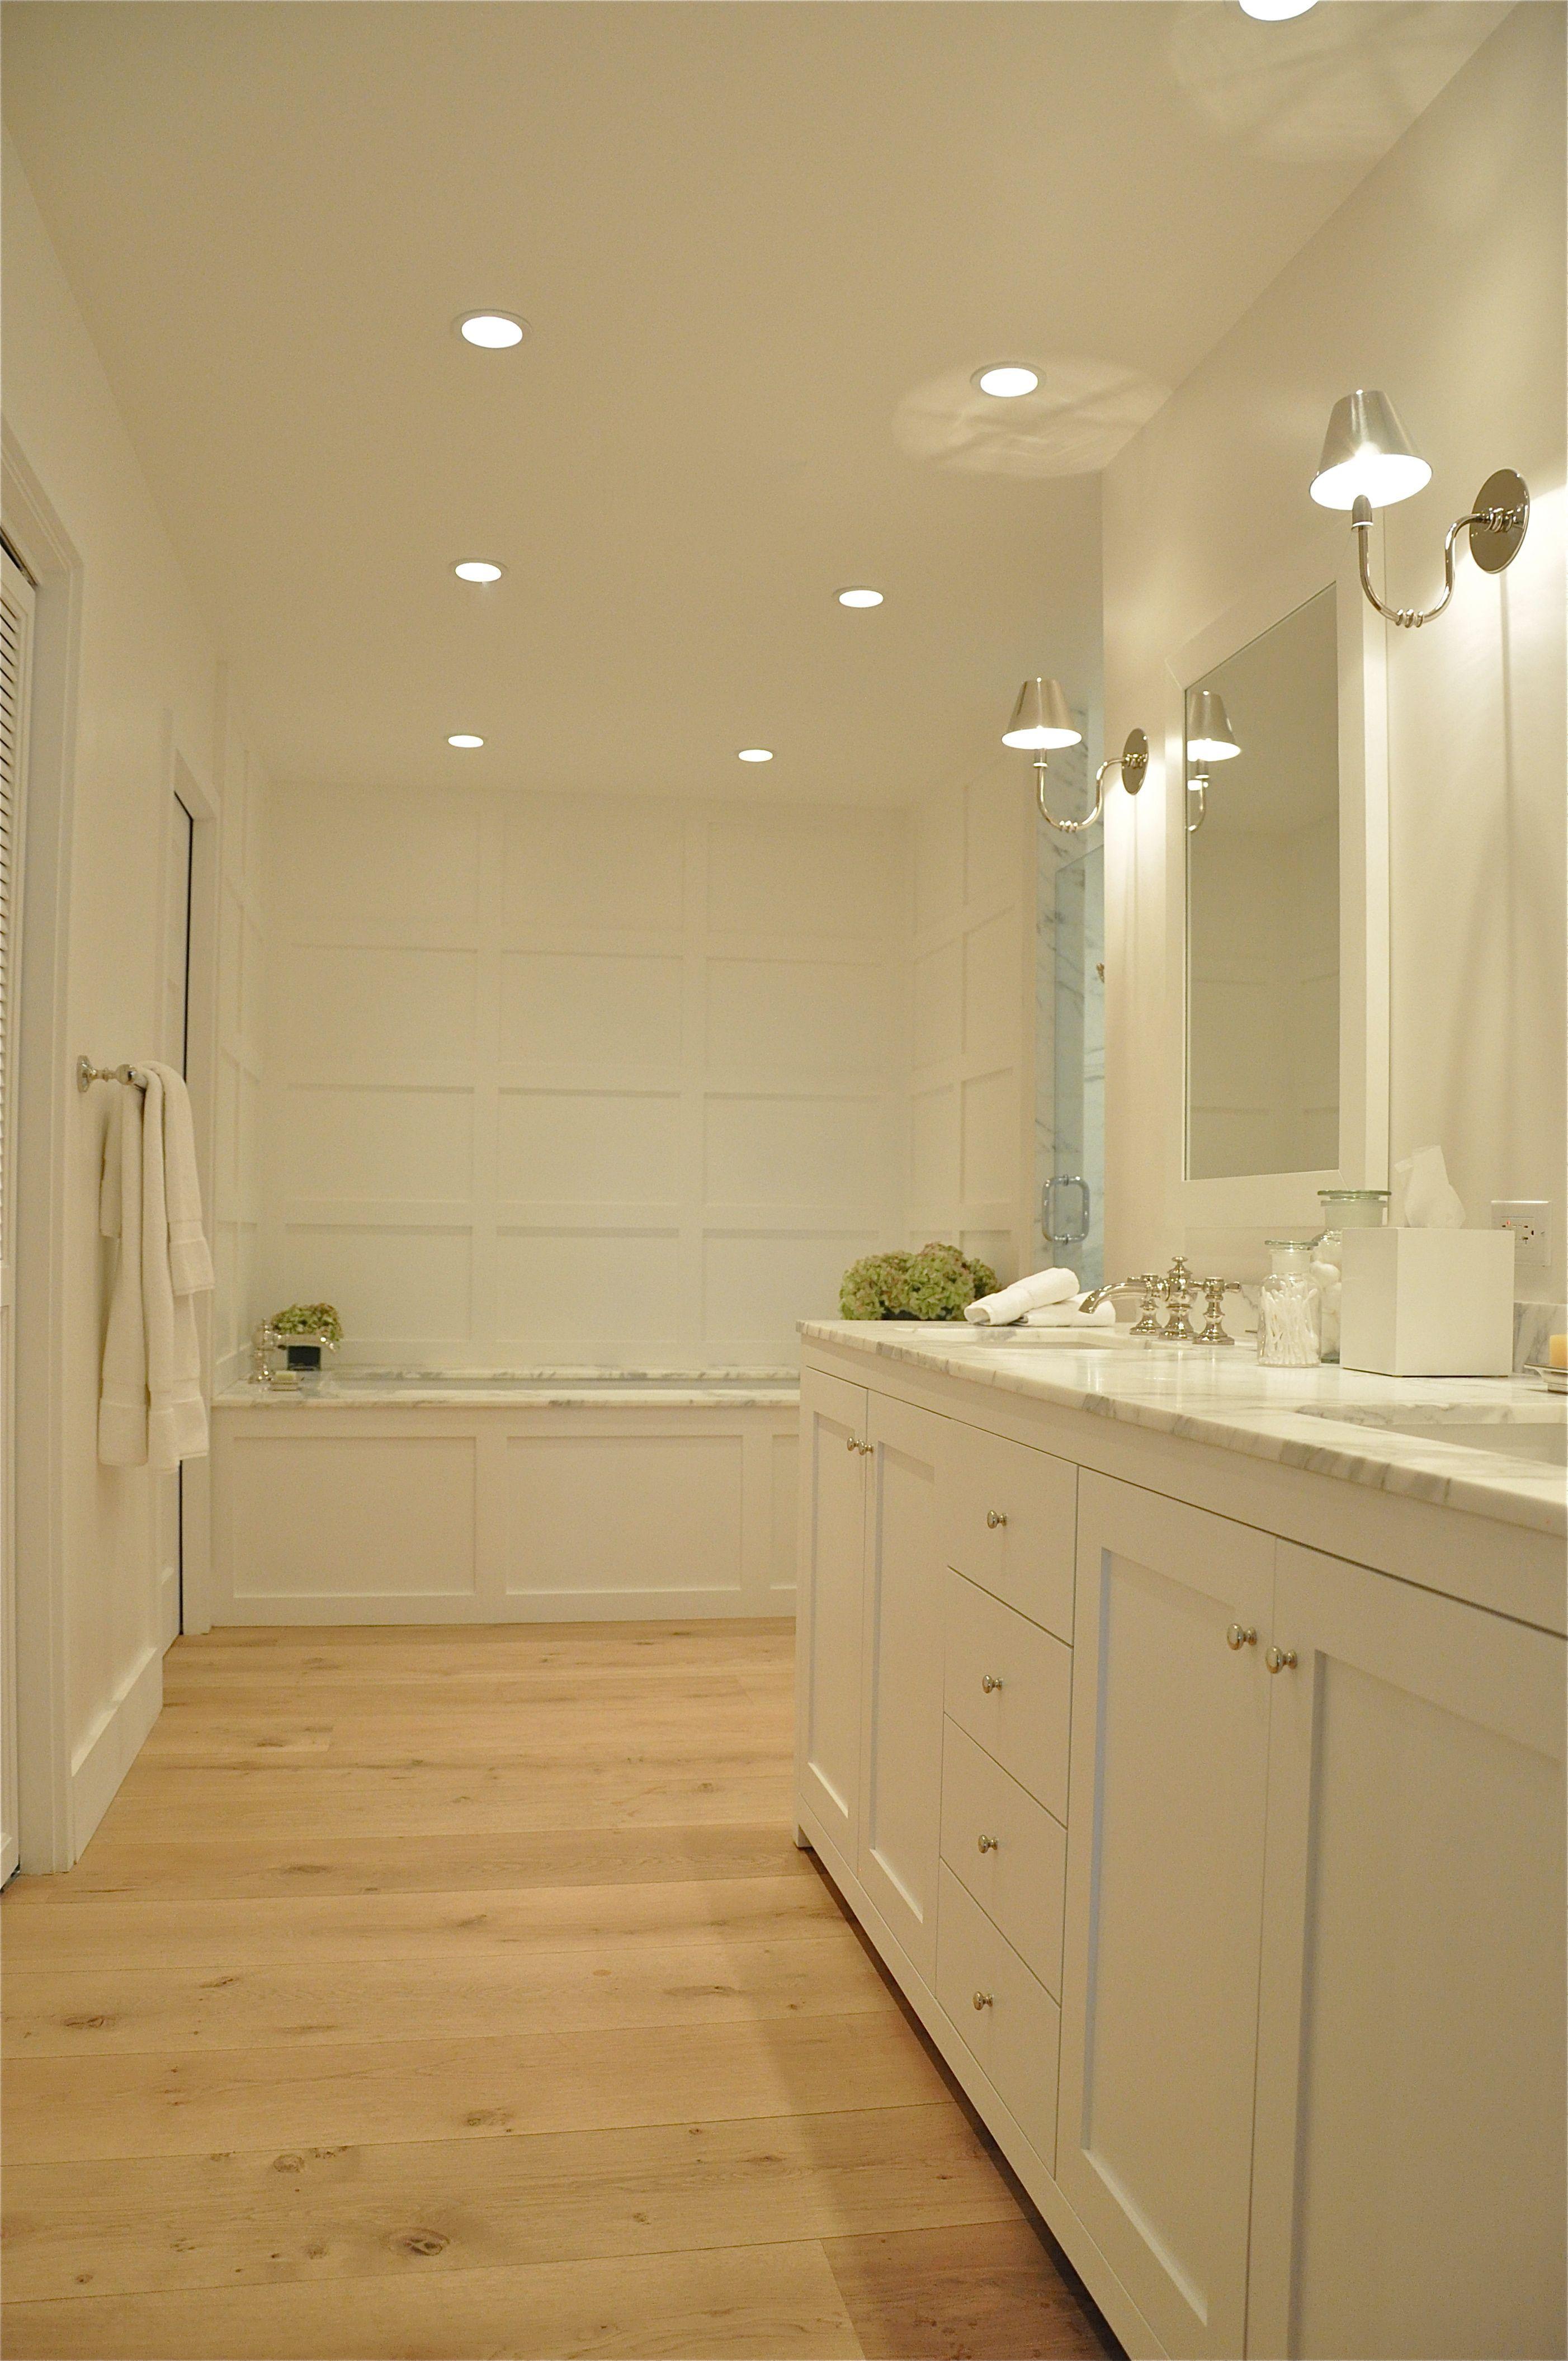 Wood Floors In Bathroom Lots Of Polyurethane And It Should